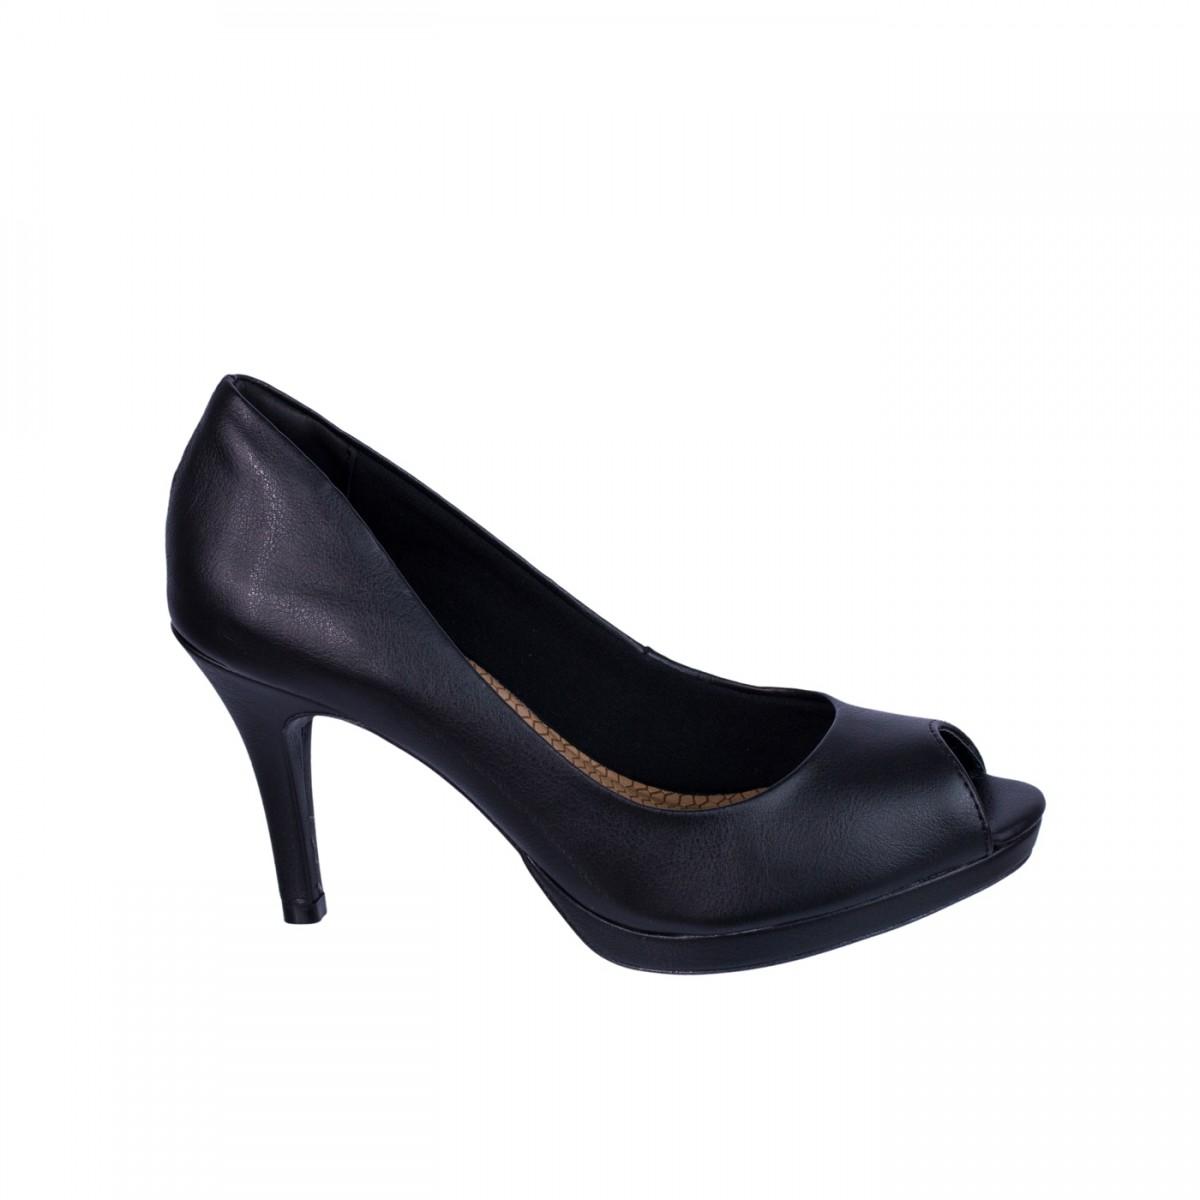 4c8f7bc6be Bizz Store - Sapato Peep Toe Feminino Via Marte Napa New